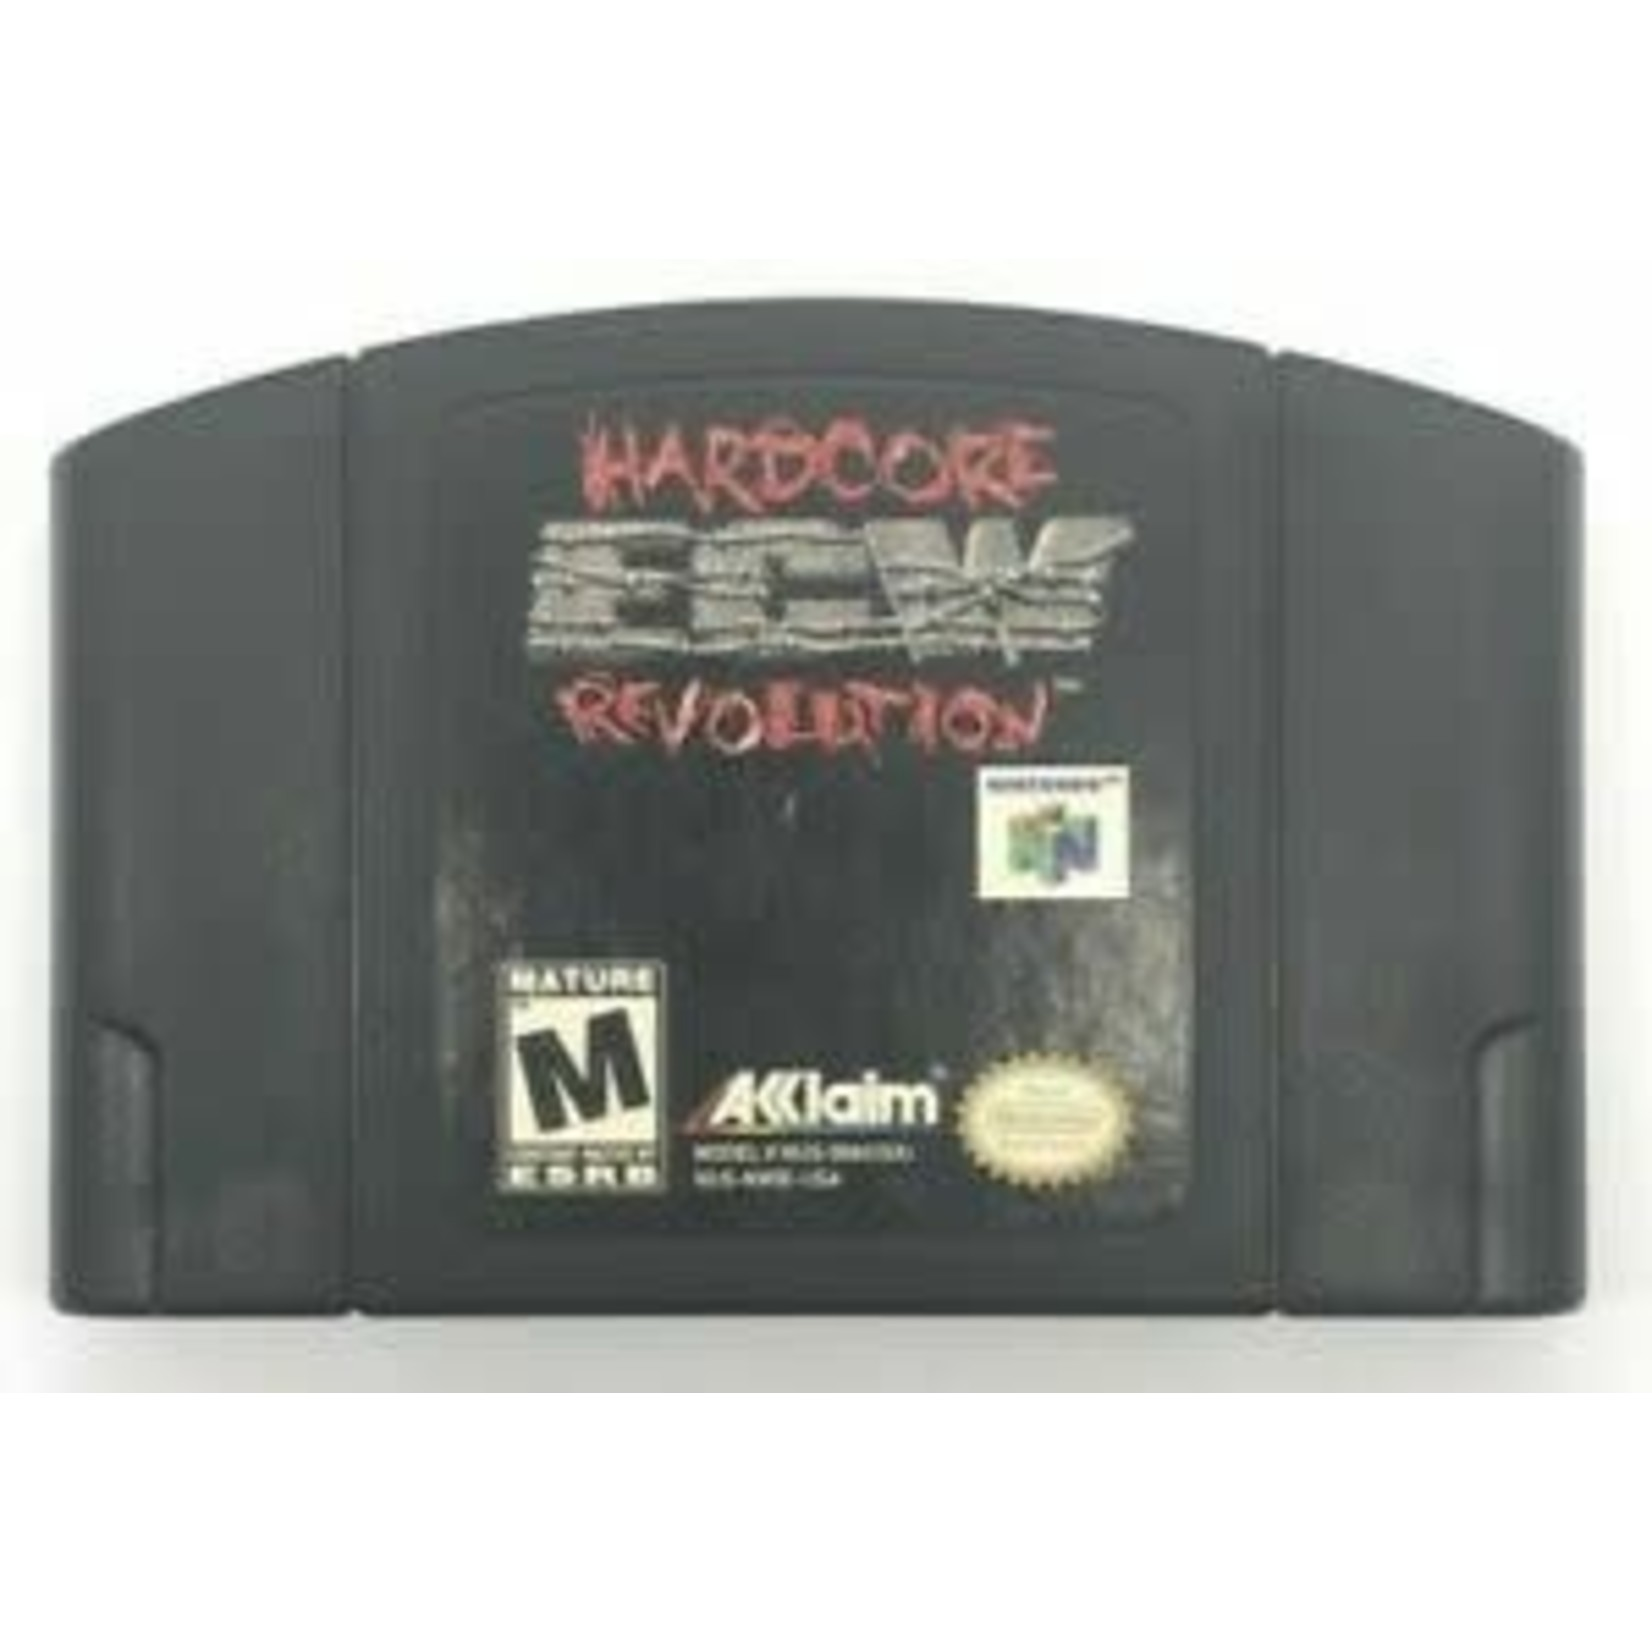 N64U-HARDCORE ECW REVOLUTION (CARTRIDGE)